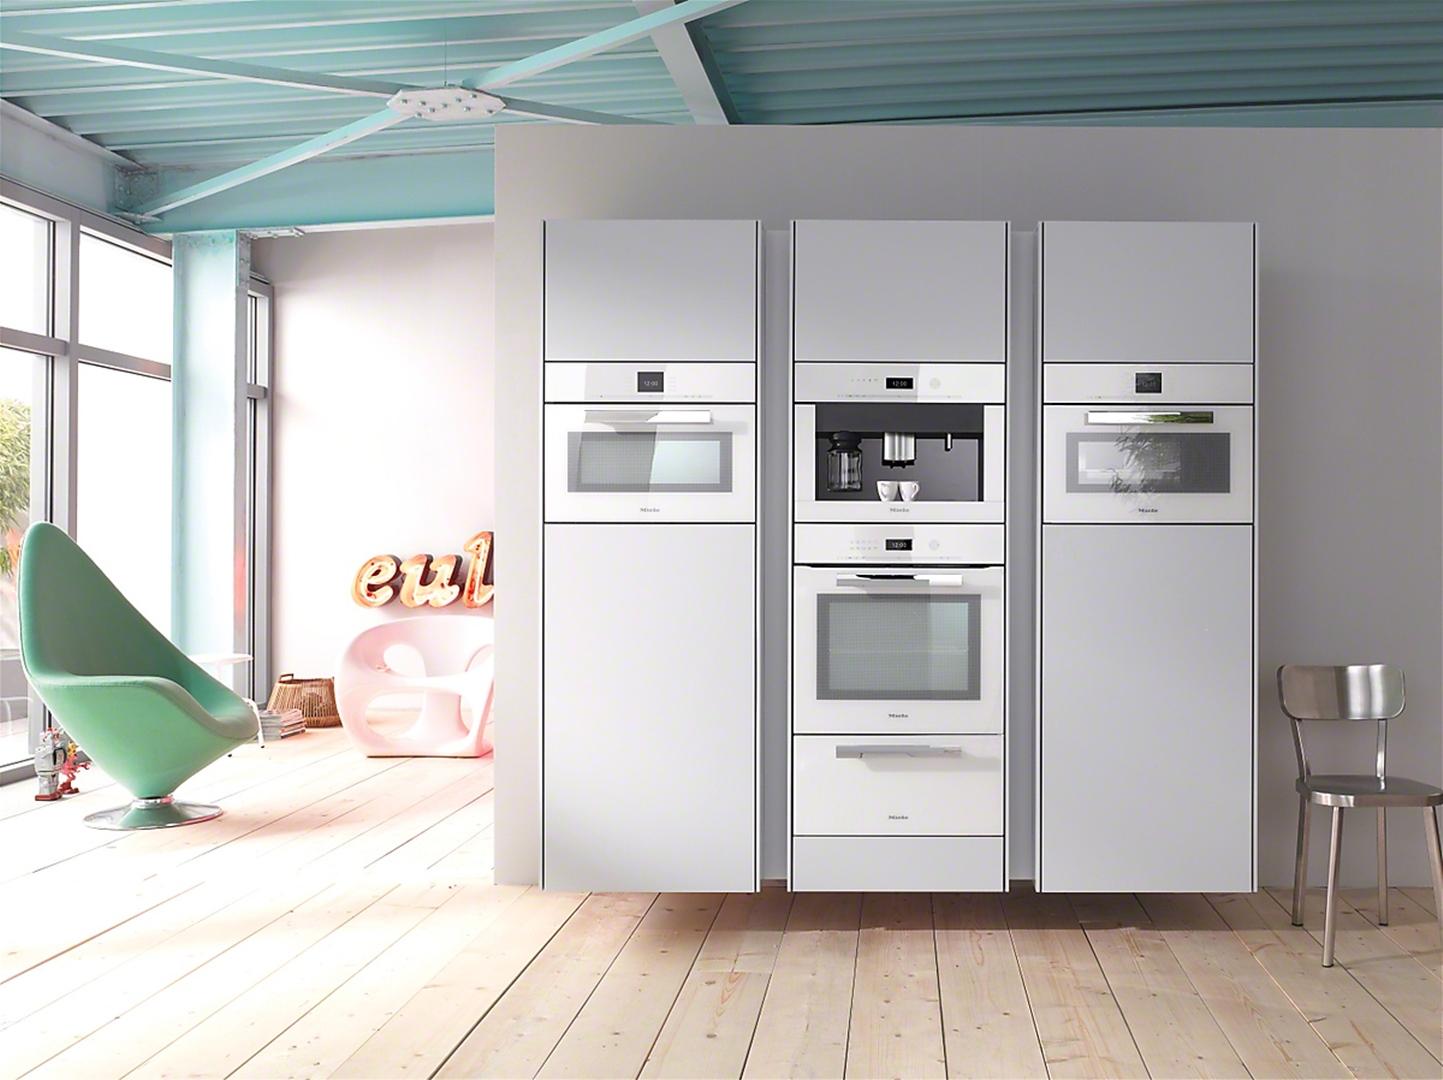 miele cva 6401 bright white coffee machines built in. Black Bedroom Furniture Sets. Home Design Ideas